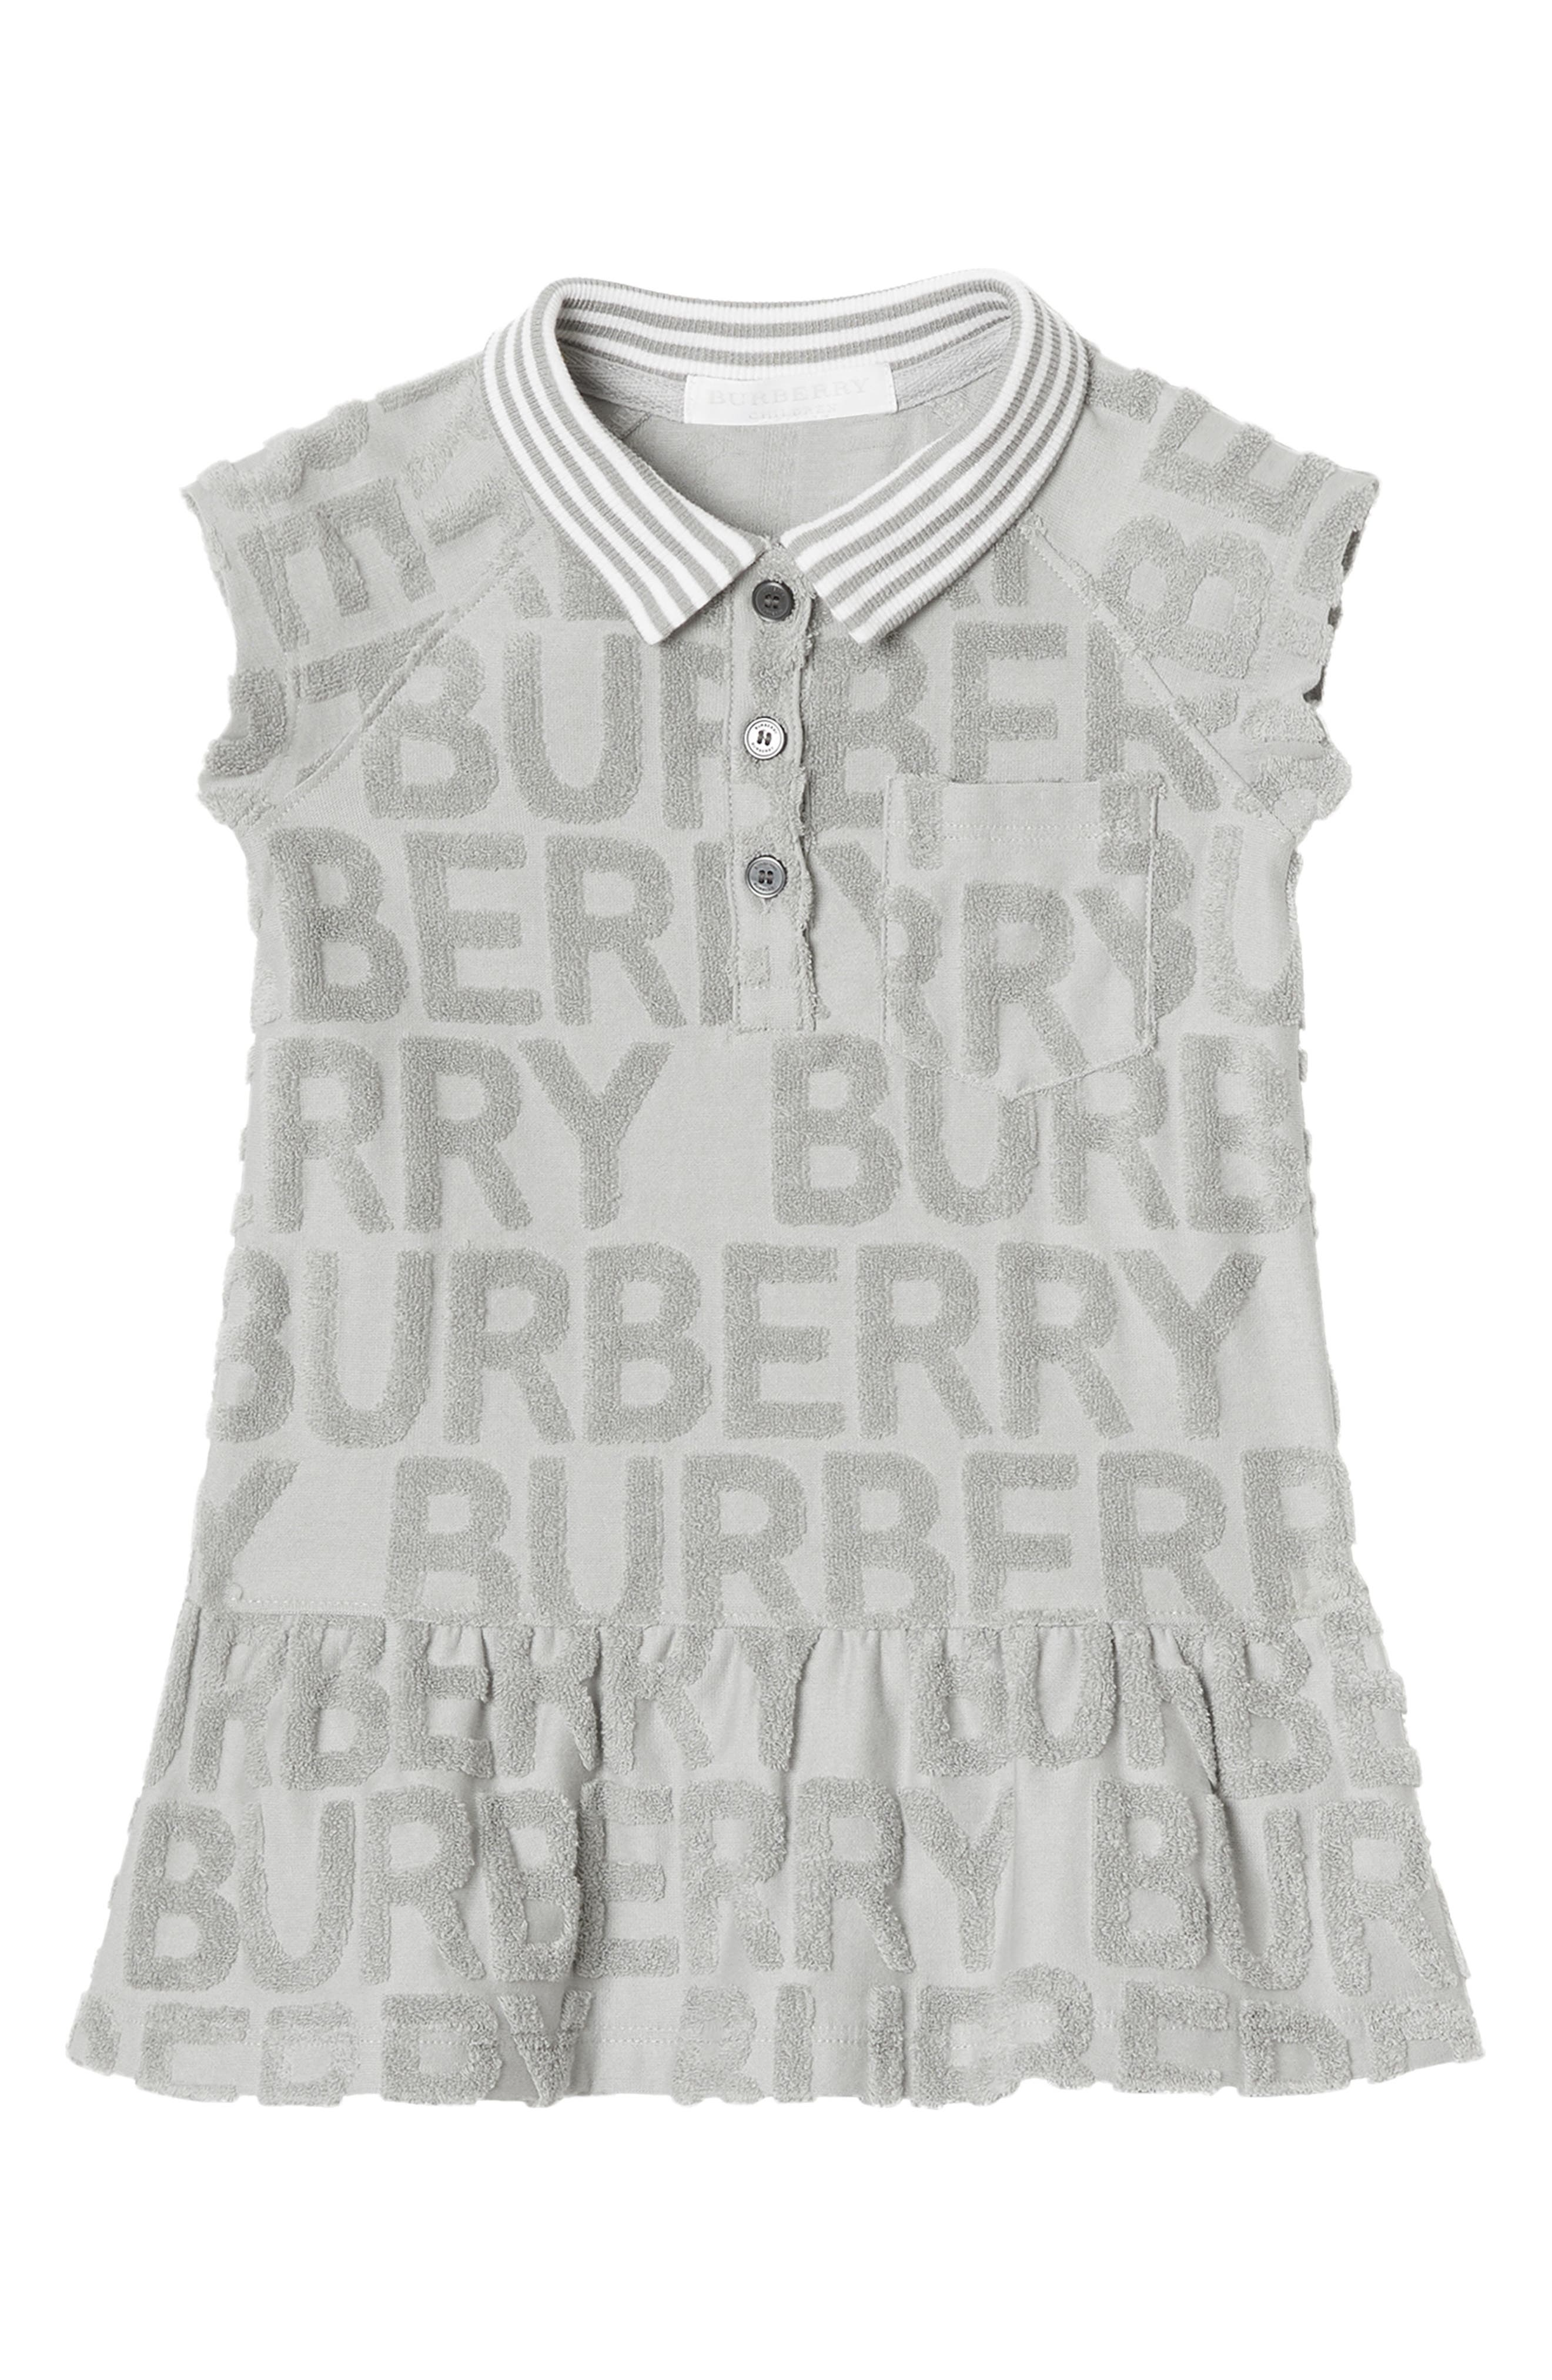 BURBERRY, Brigitta Knit Polo Dress, Main thumbnail 1, color, PALE GREY